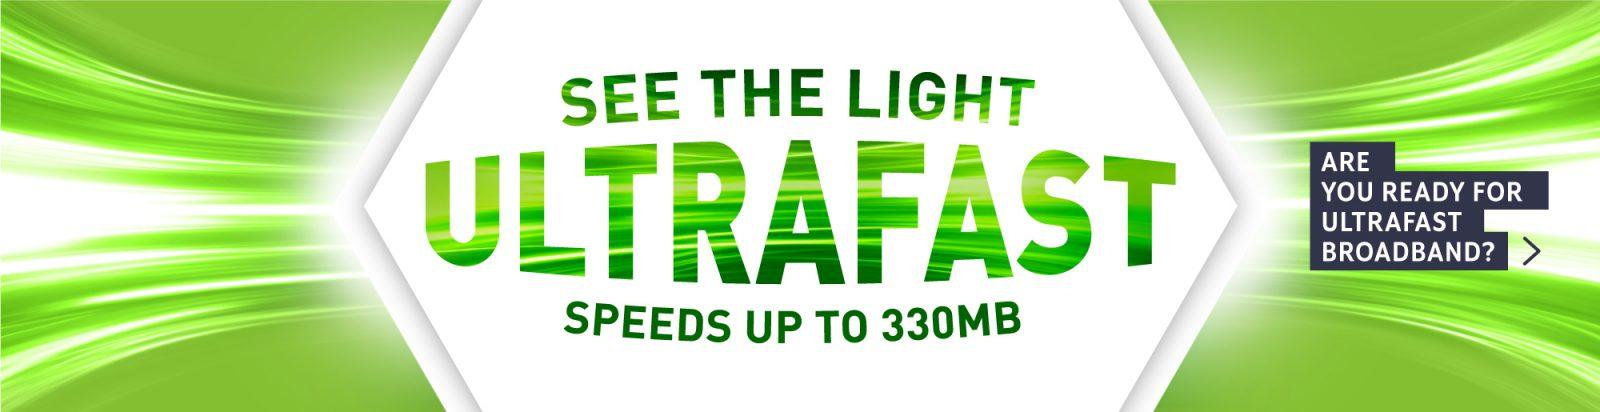 UltraFast Broadband Banner